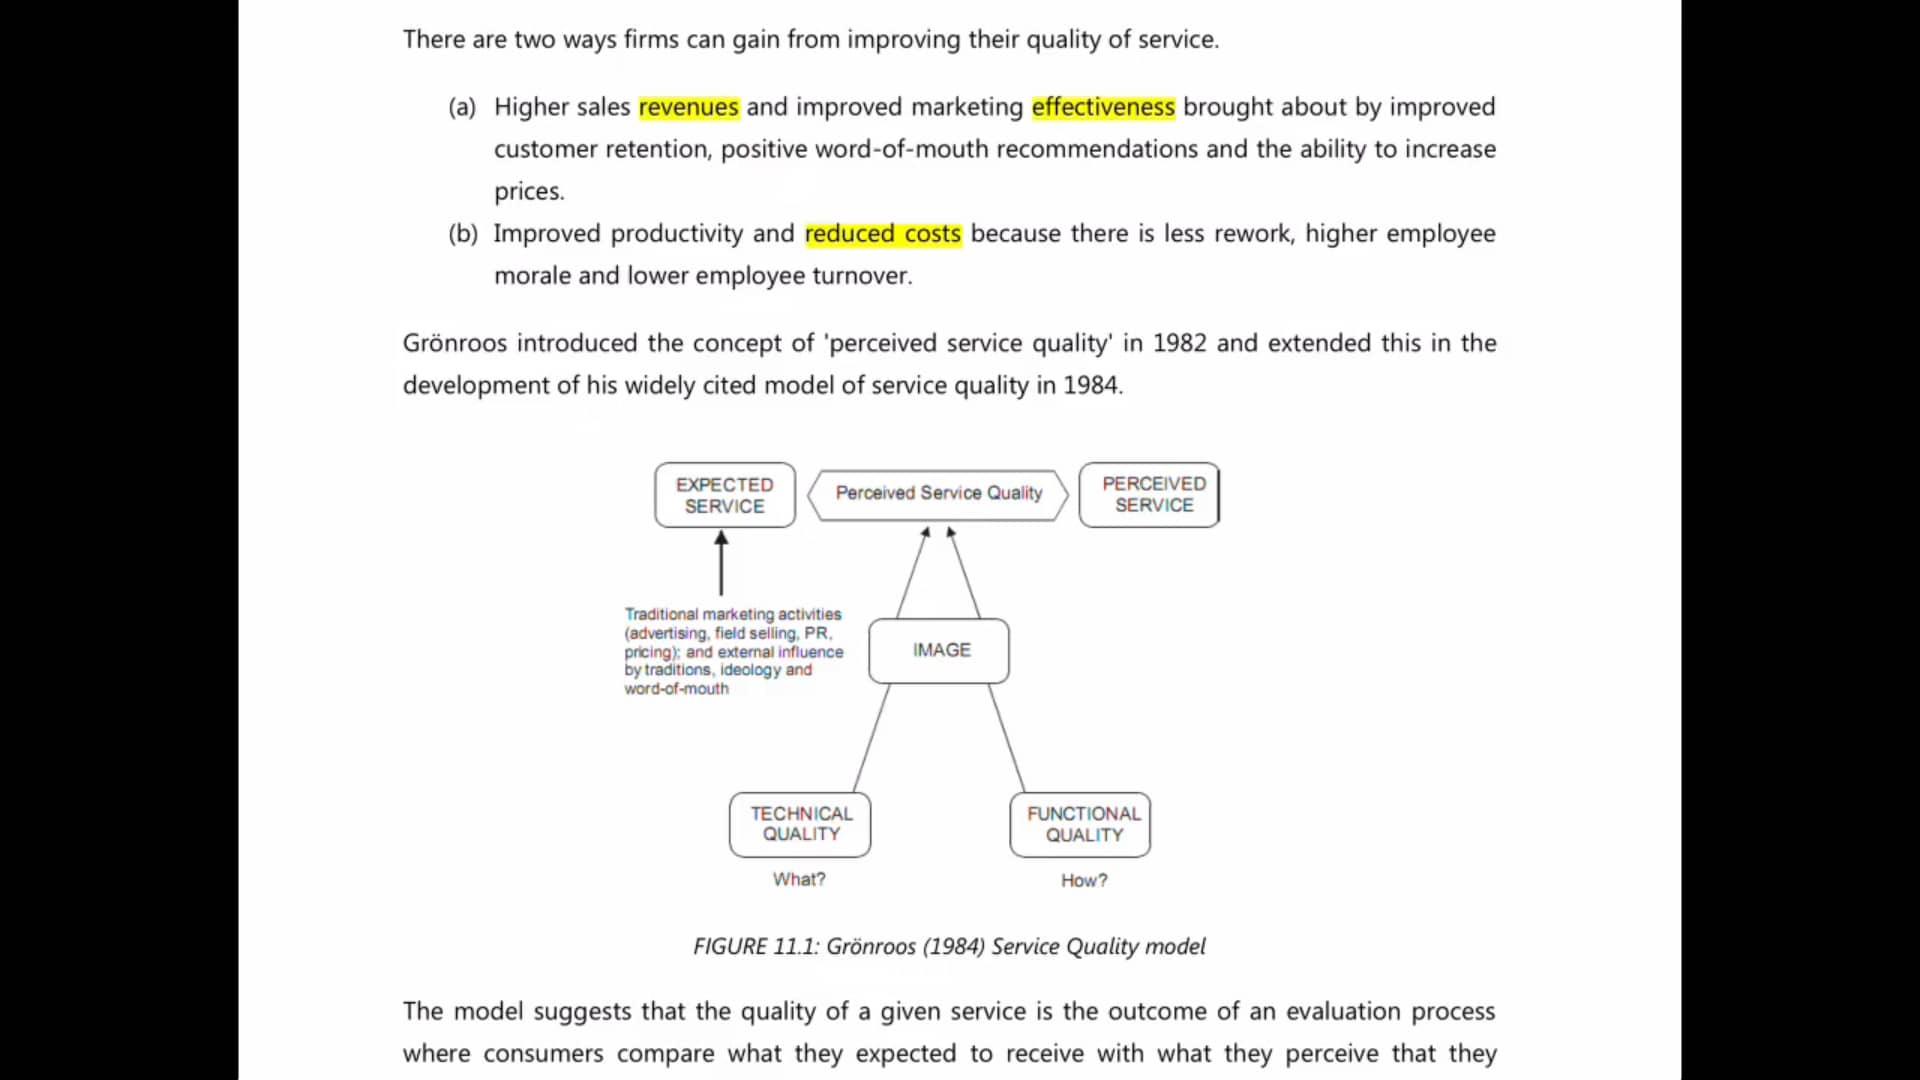 Ch 11 - Service Quality